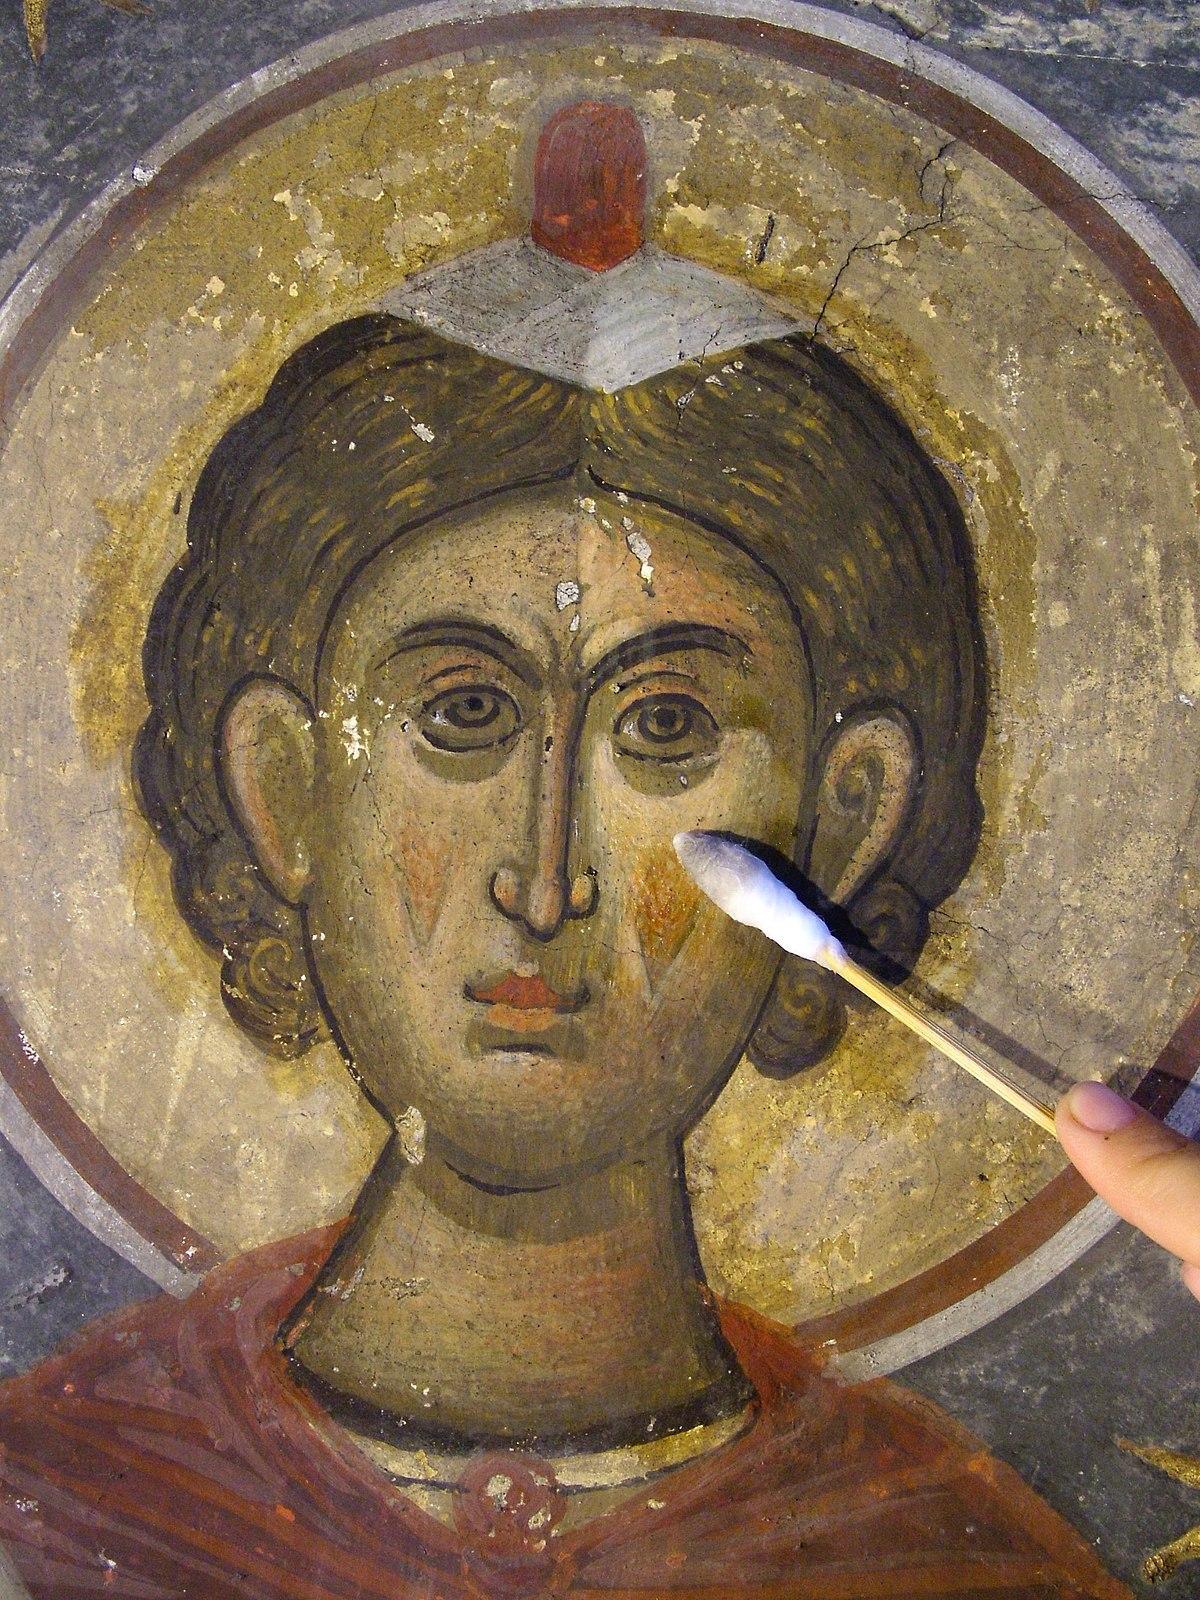 Conservationrestoration of cultural heritage  Wikipedia